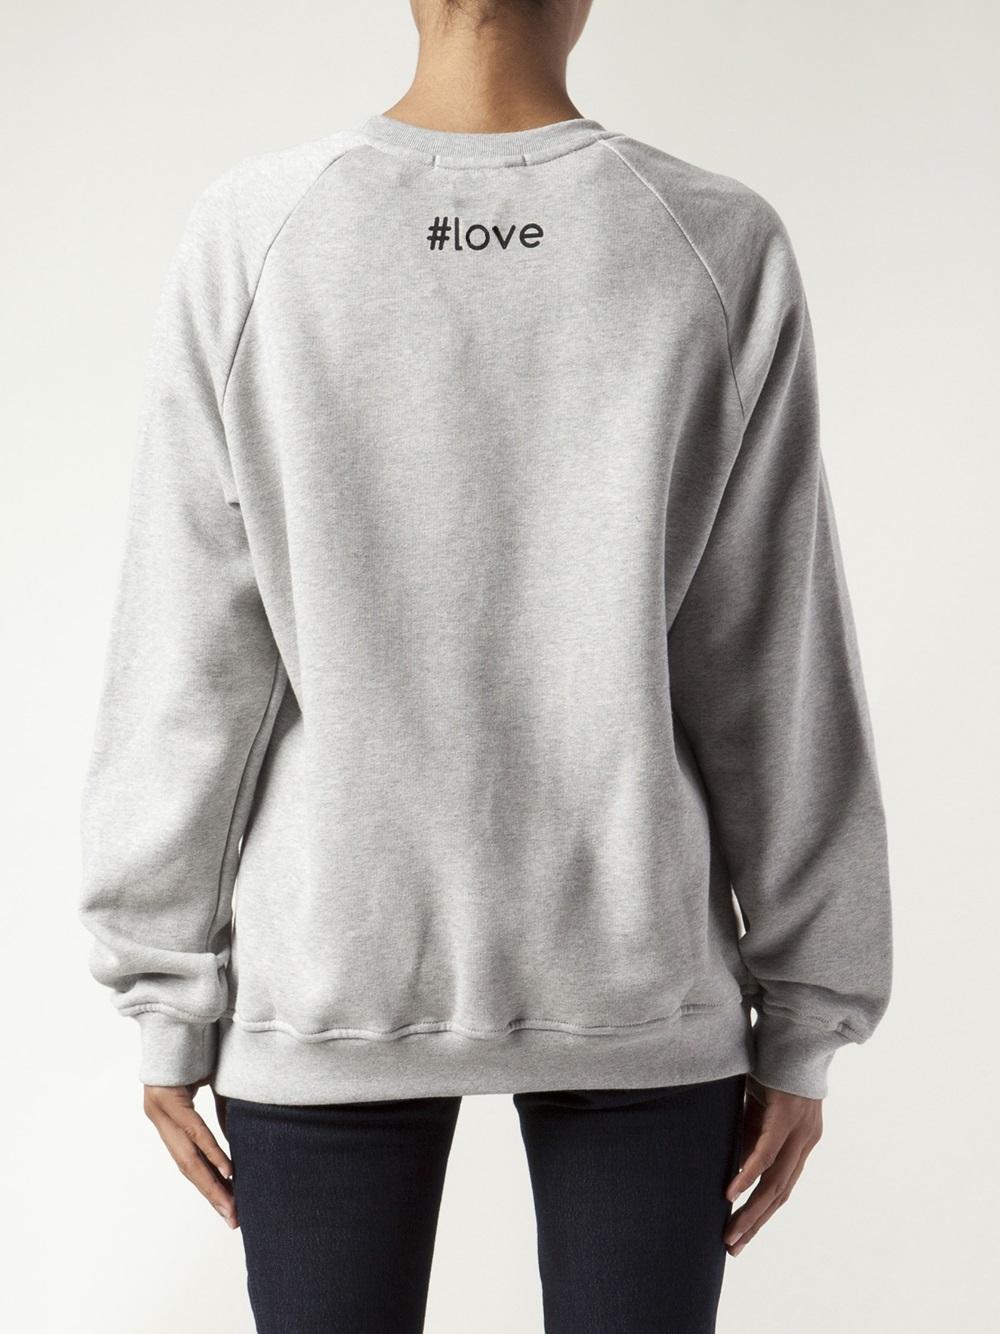 Msgm Heart Print Sweatshirt In Gray Lyst